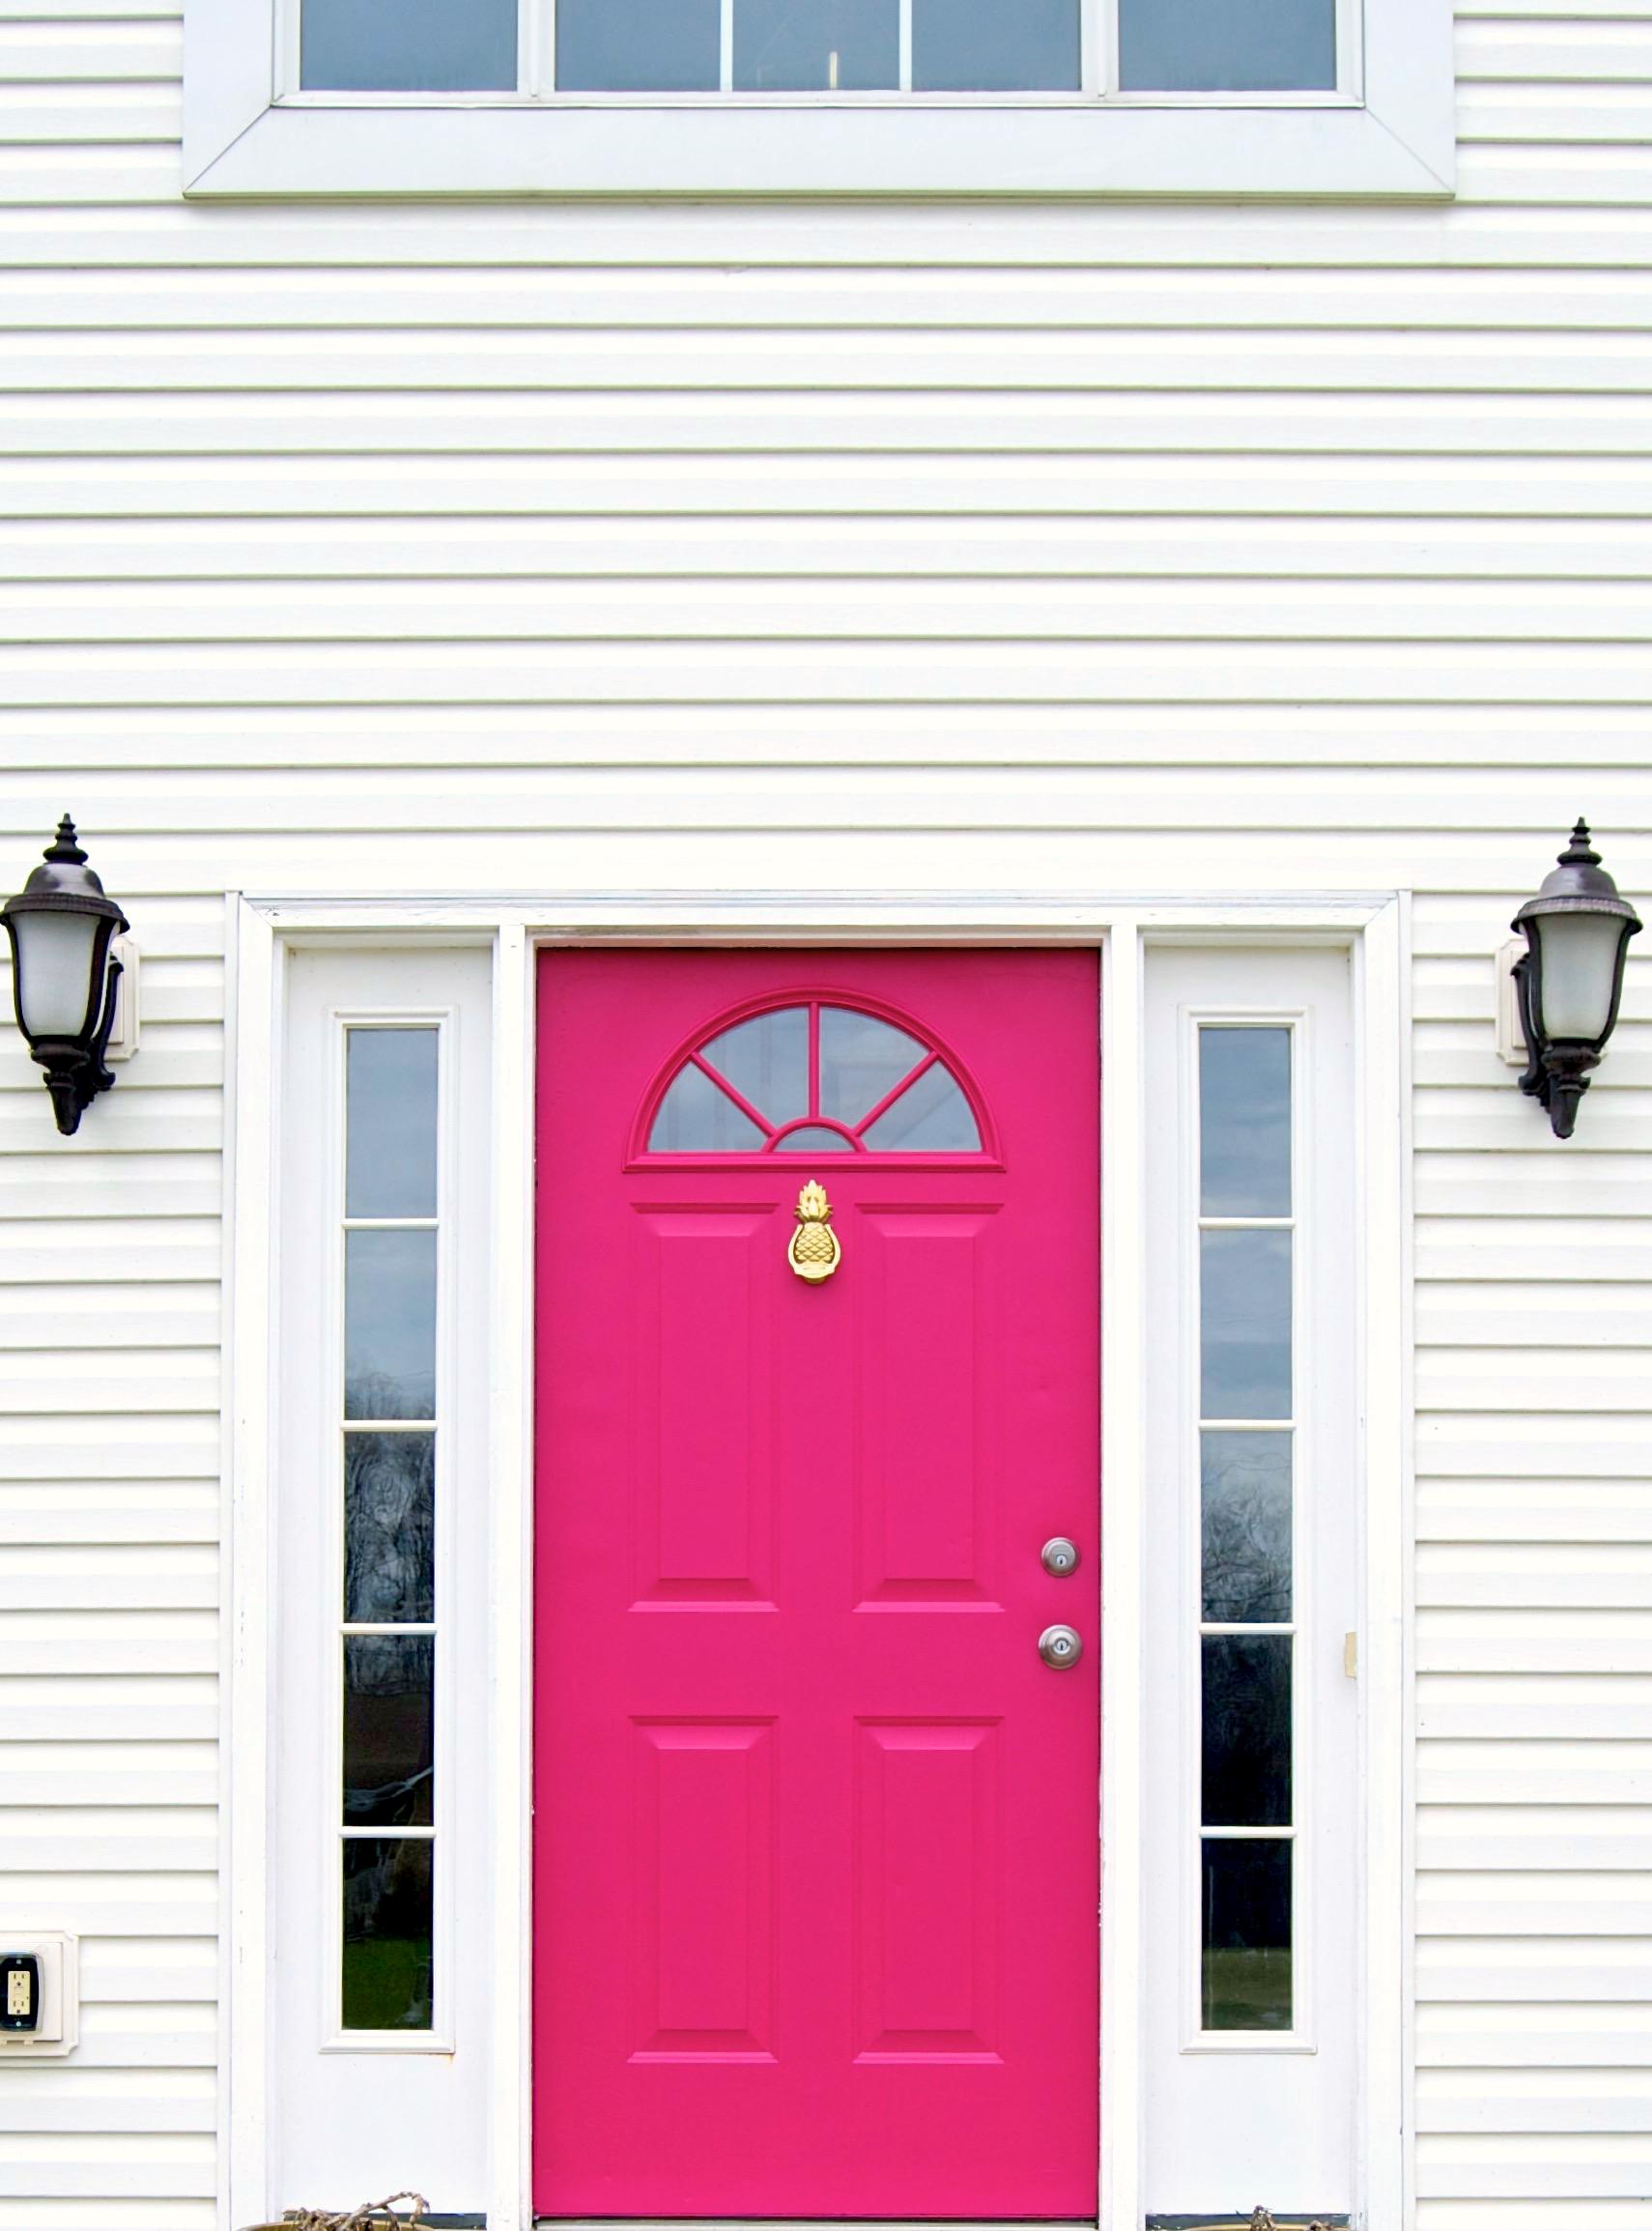 Hot Pink Door With Brass Pineapple Doorknocker. This door was painted with Behr Exterior Paint in Pagoda. See more details at ericahammer.com/blog